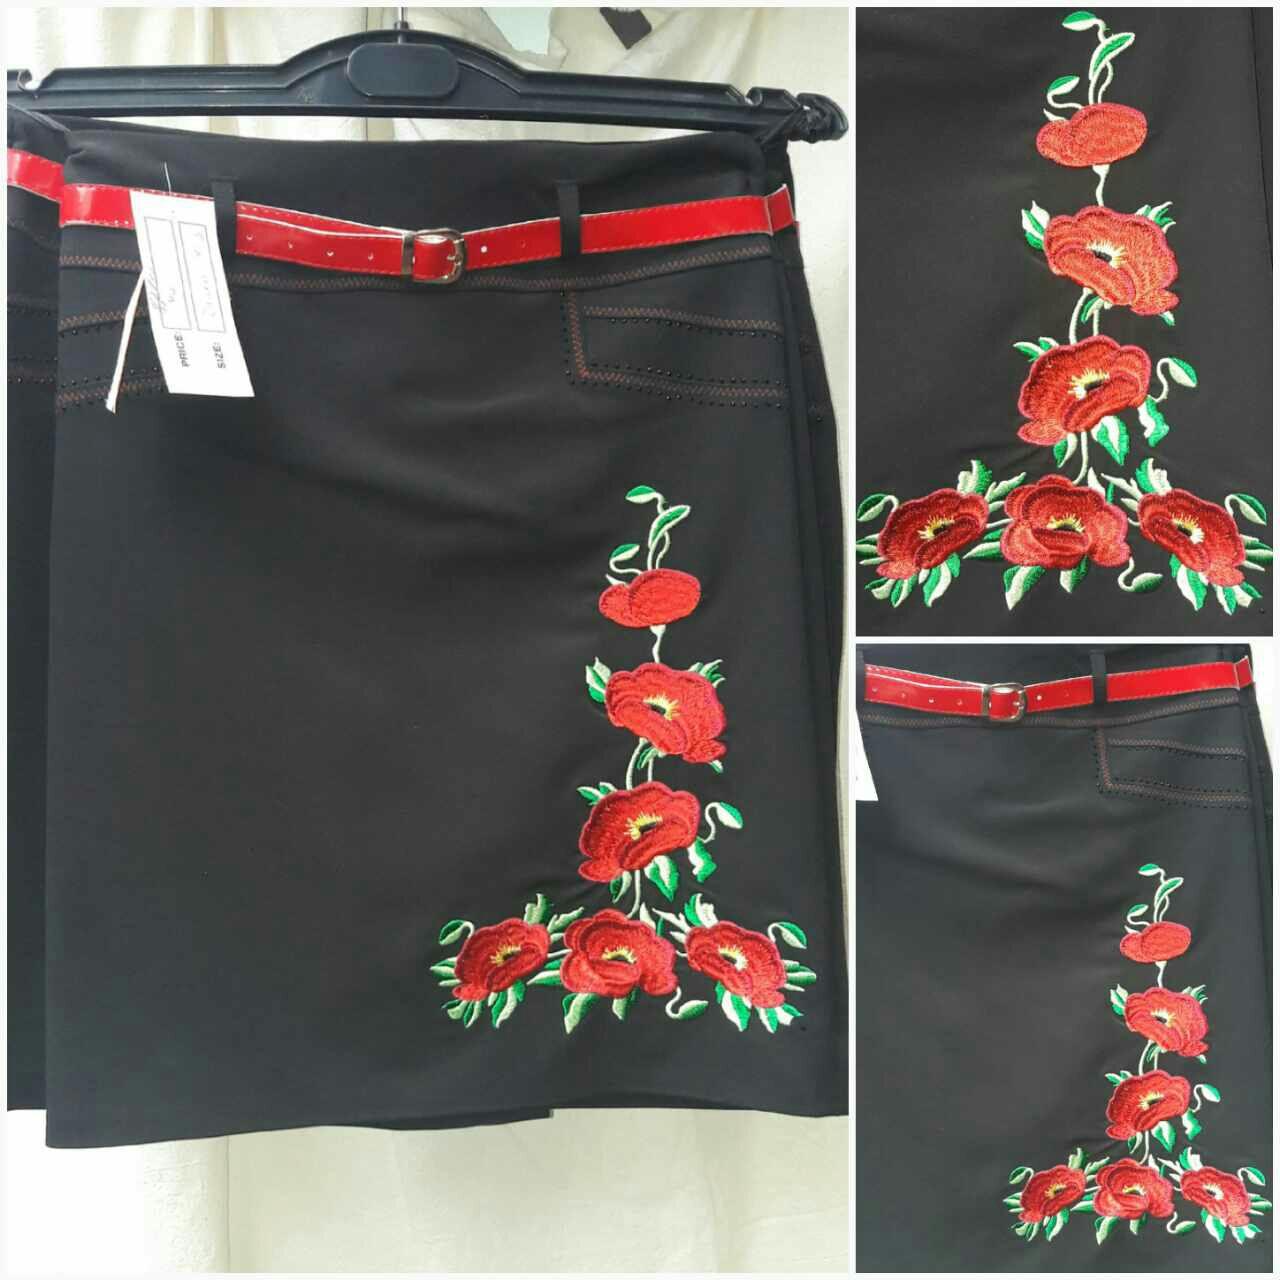 Черная юбка с вышивкой, пояс, 44-52 р-ры, 375/325 (цена за 1 шт. + 50 гр.)